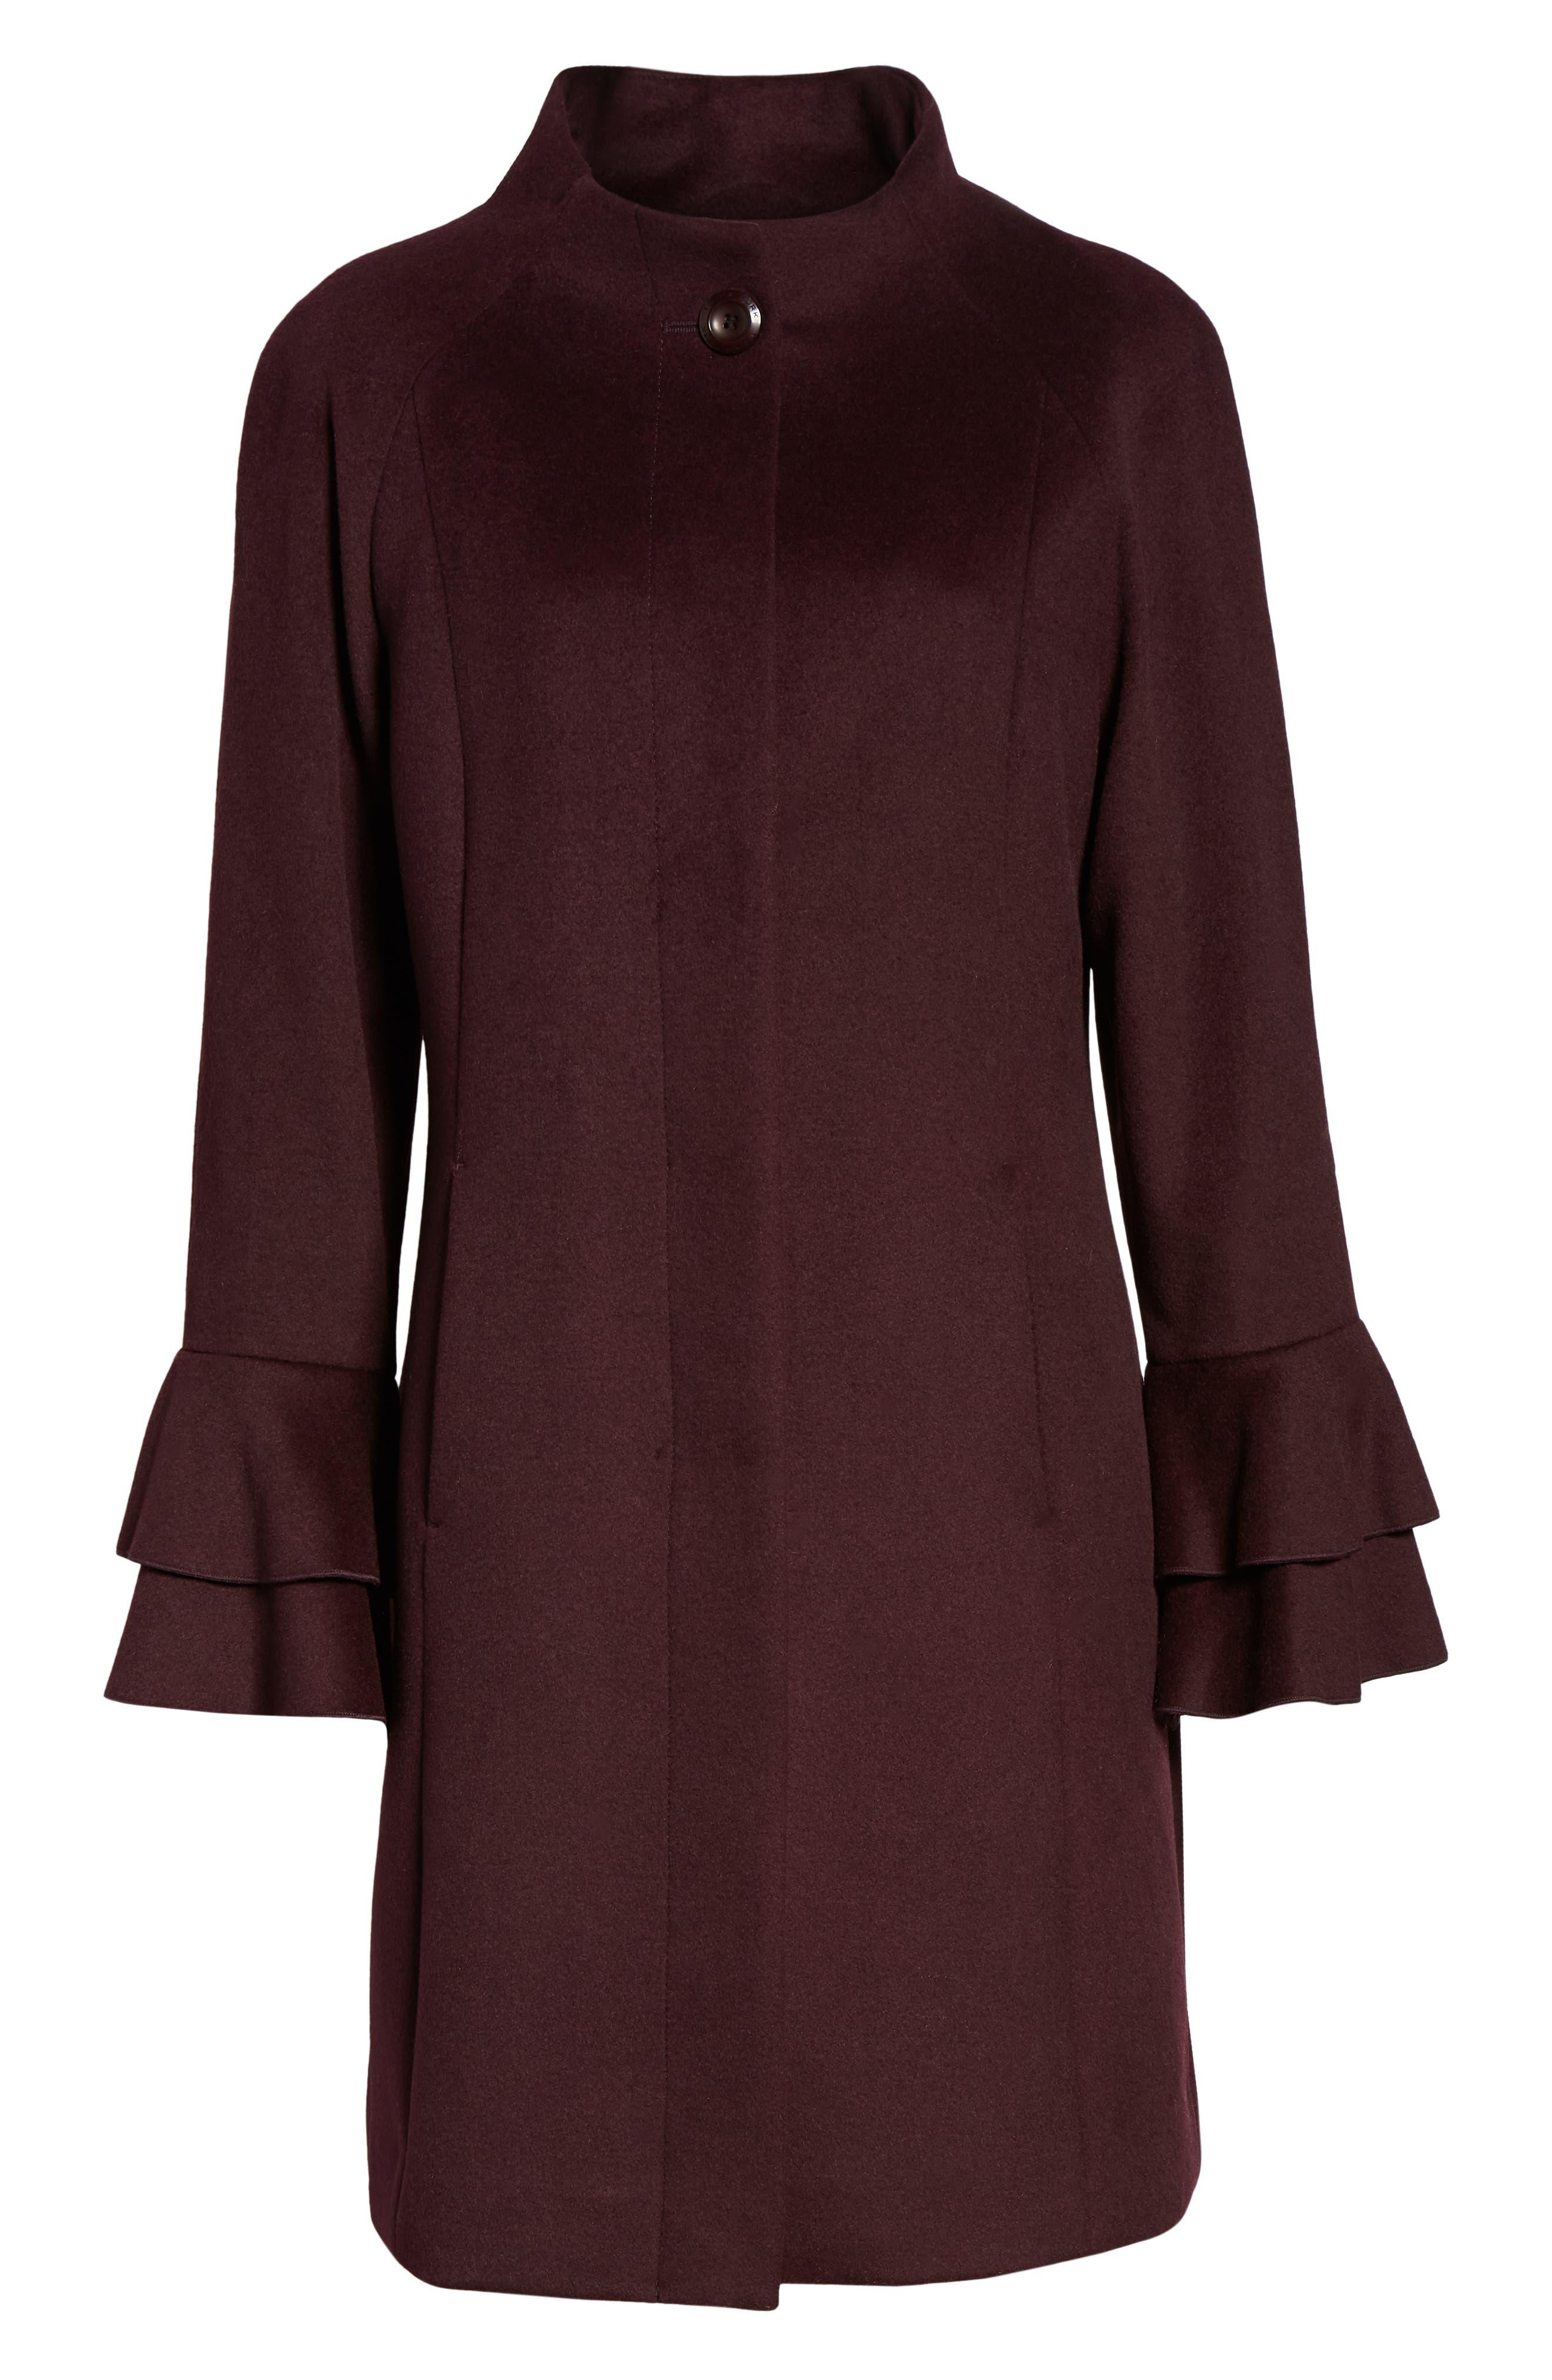 Sara Ruffle Cuff Wool Blend Coat,                             Alternate thumbnail 6, color,                             WINE